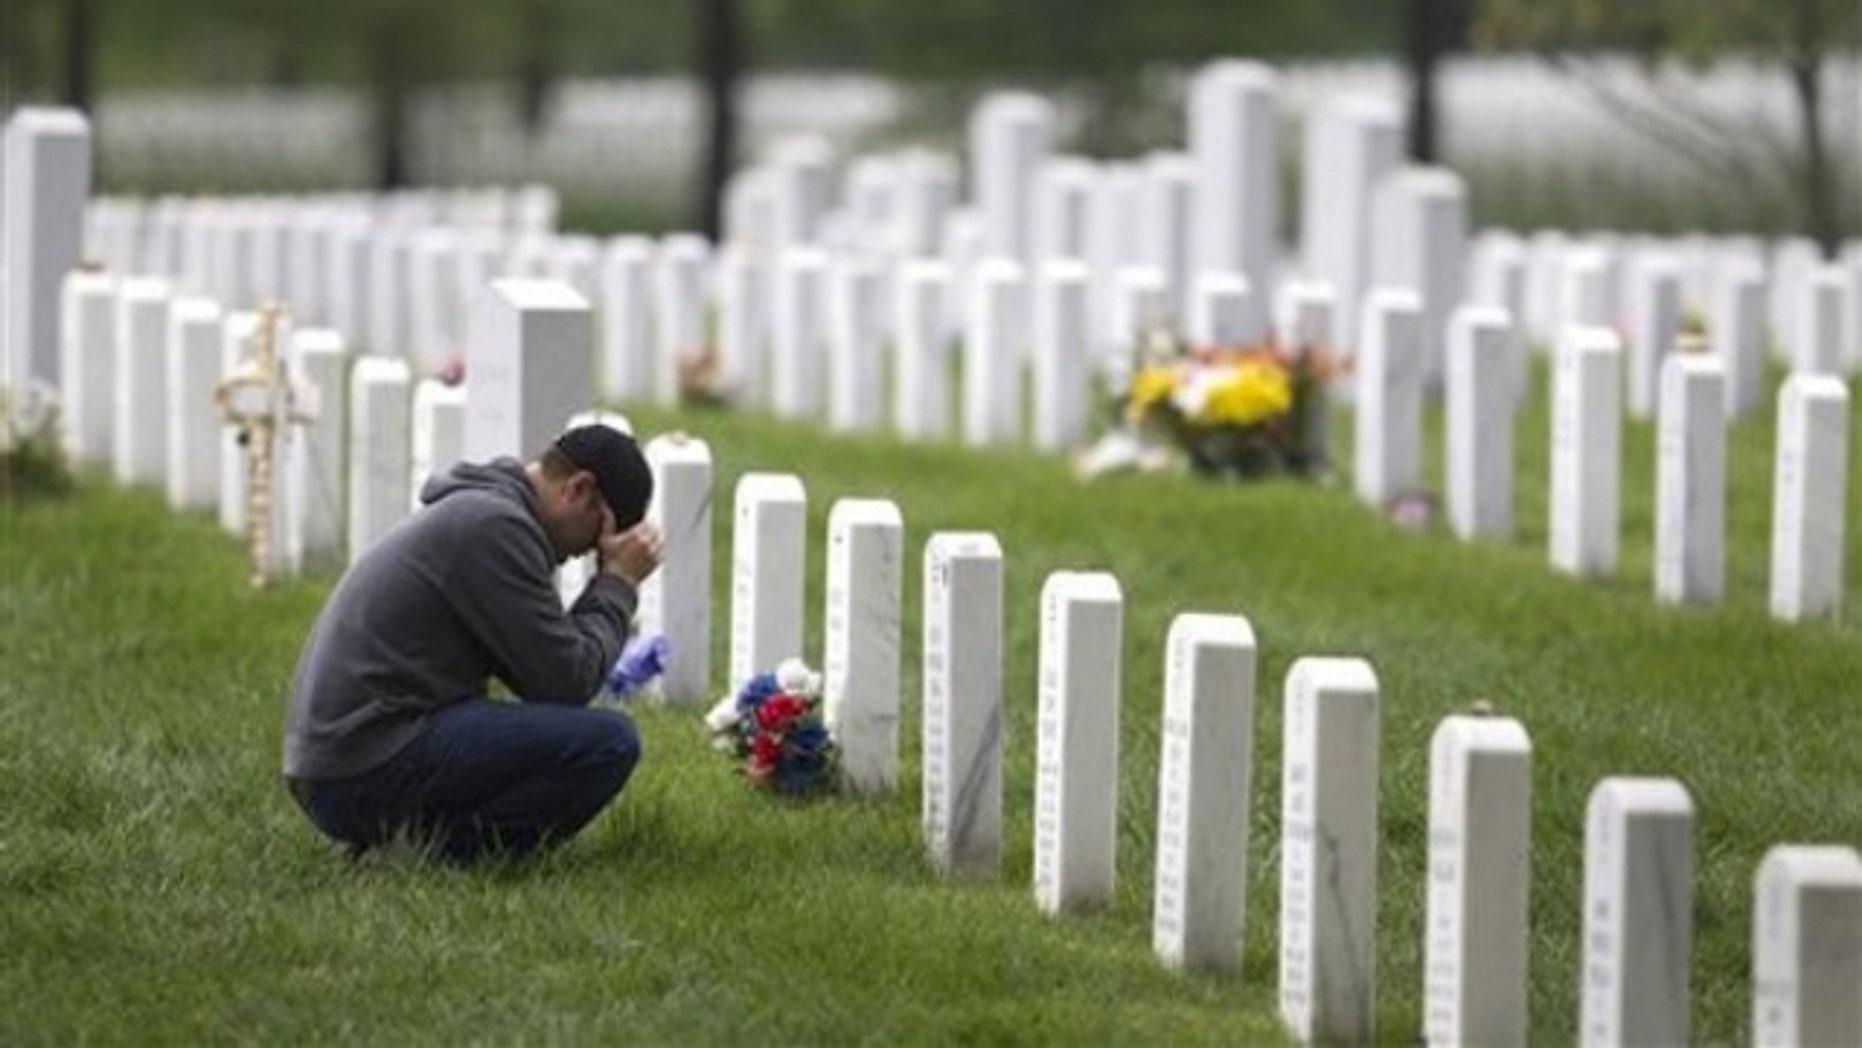 A former Marine is shown at Arlington National Cemetery in Arlington, Va., May 2.